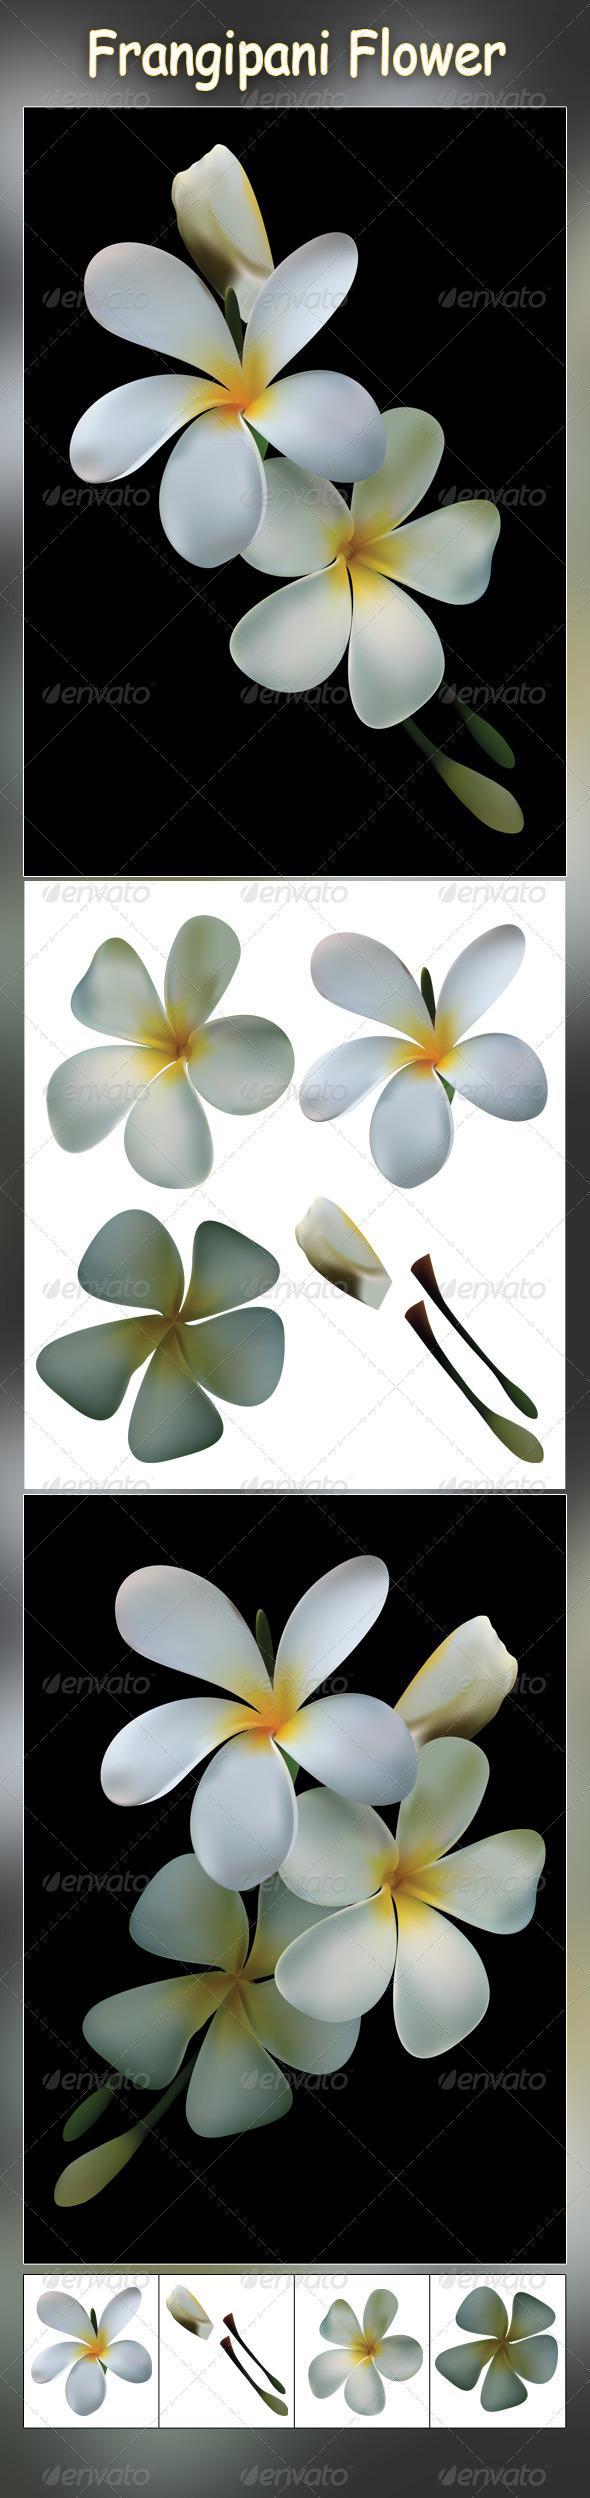 GraphicRiver Frangipani Flower 3270430